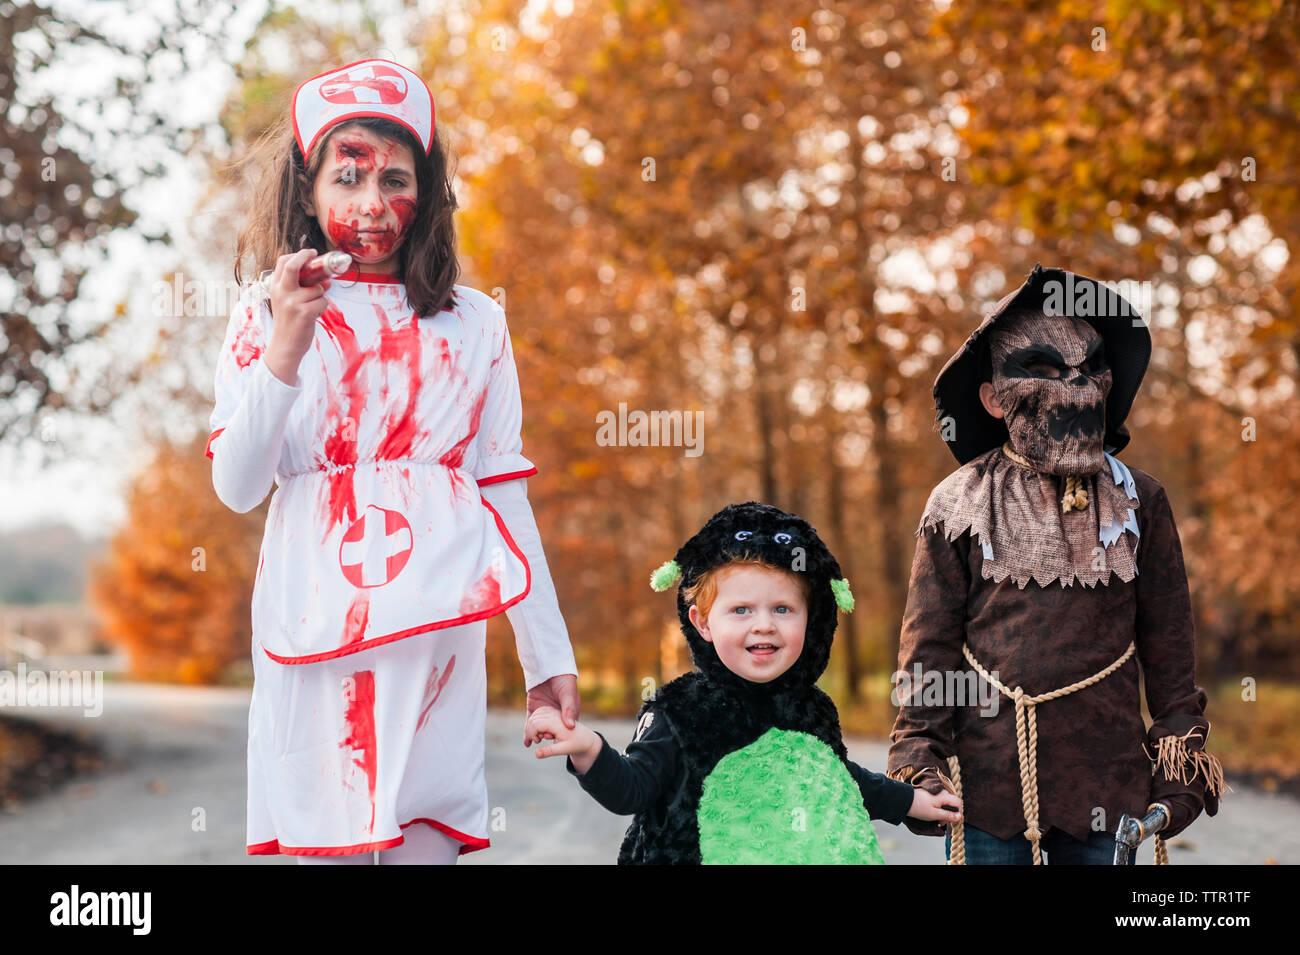 Ragazzi Costume Di Halloween Zucca Spaventosa Kids